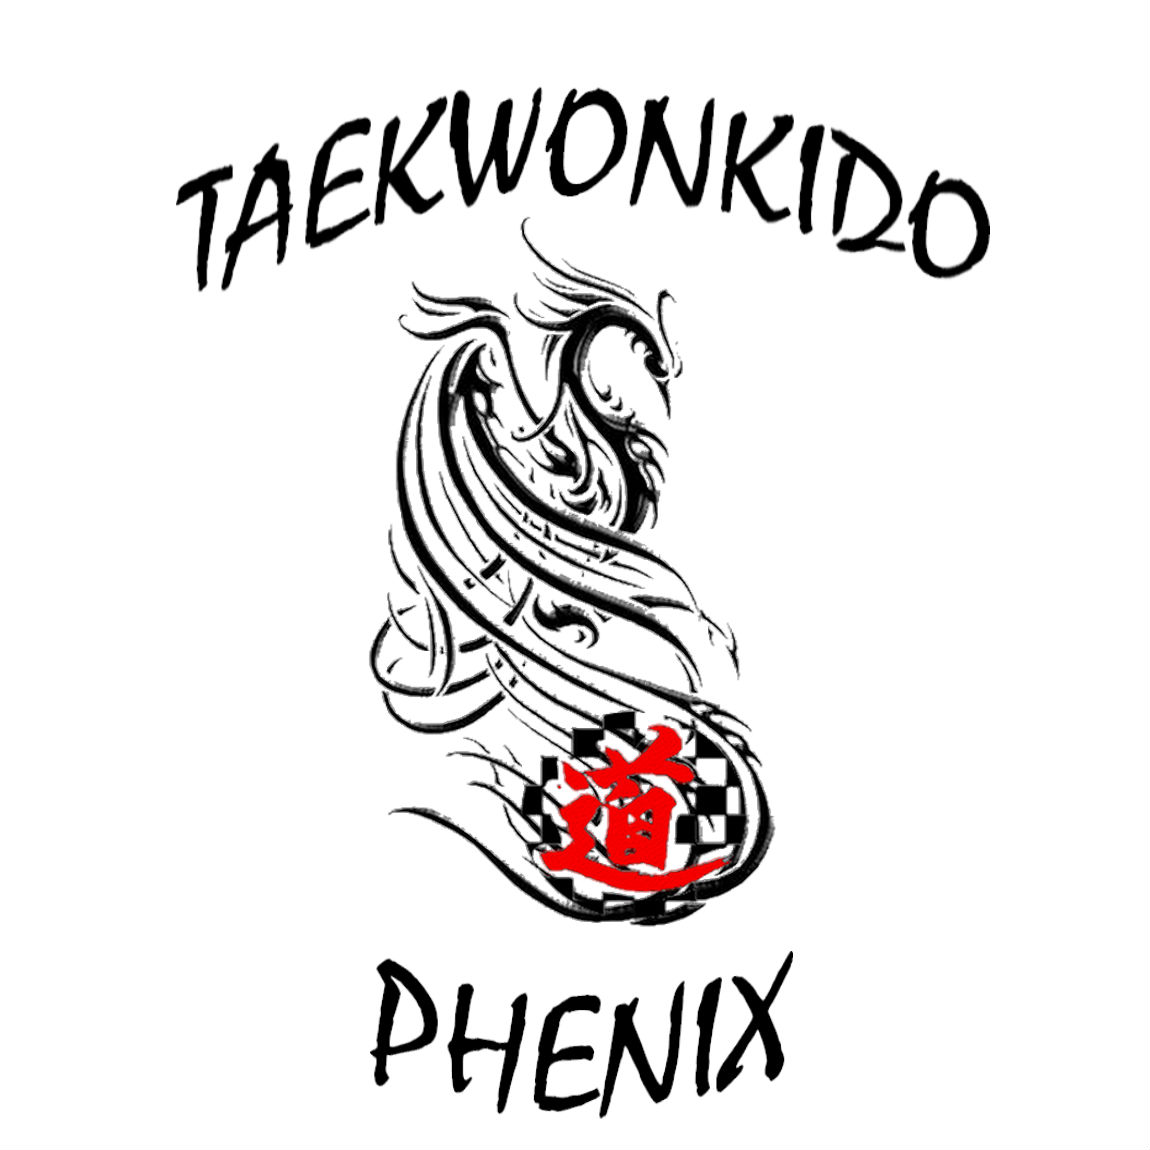 Association - Taekwonkido Phenix